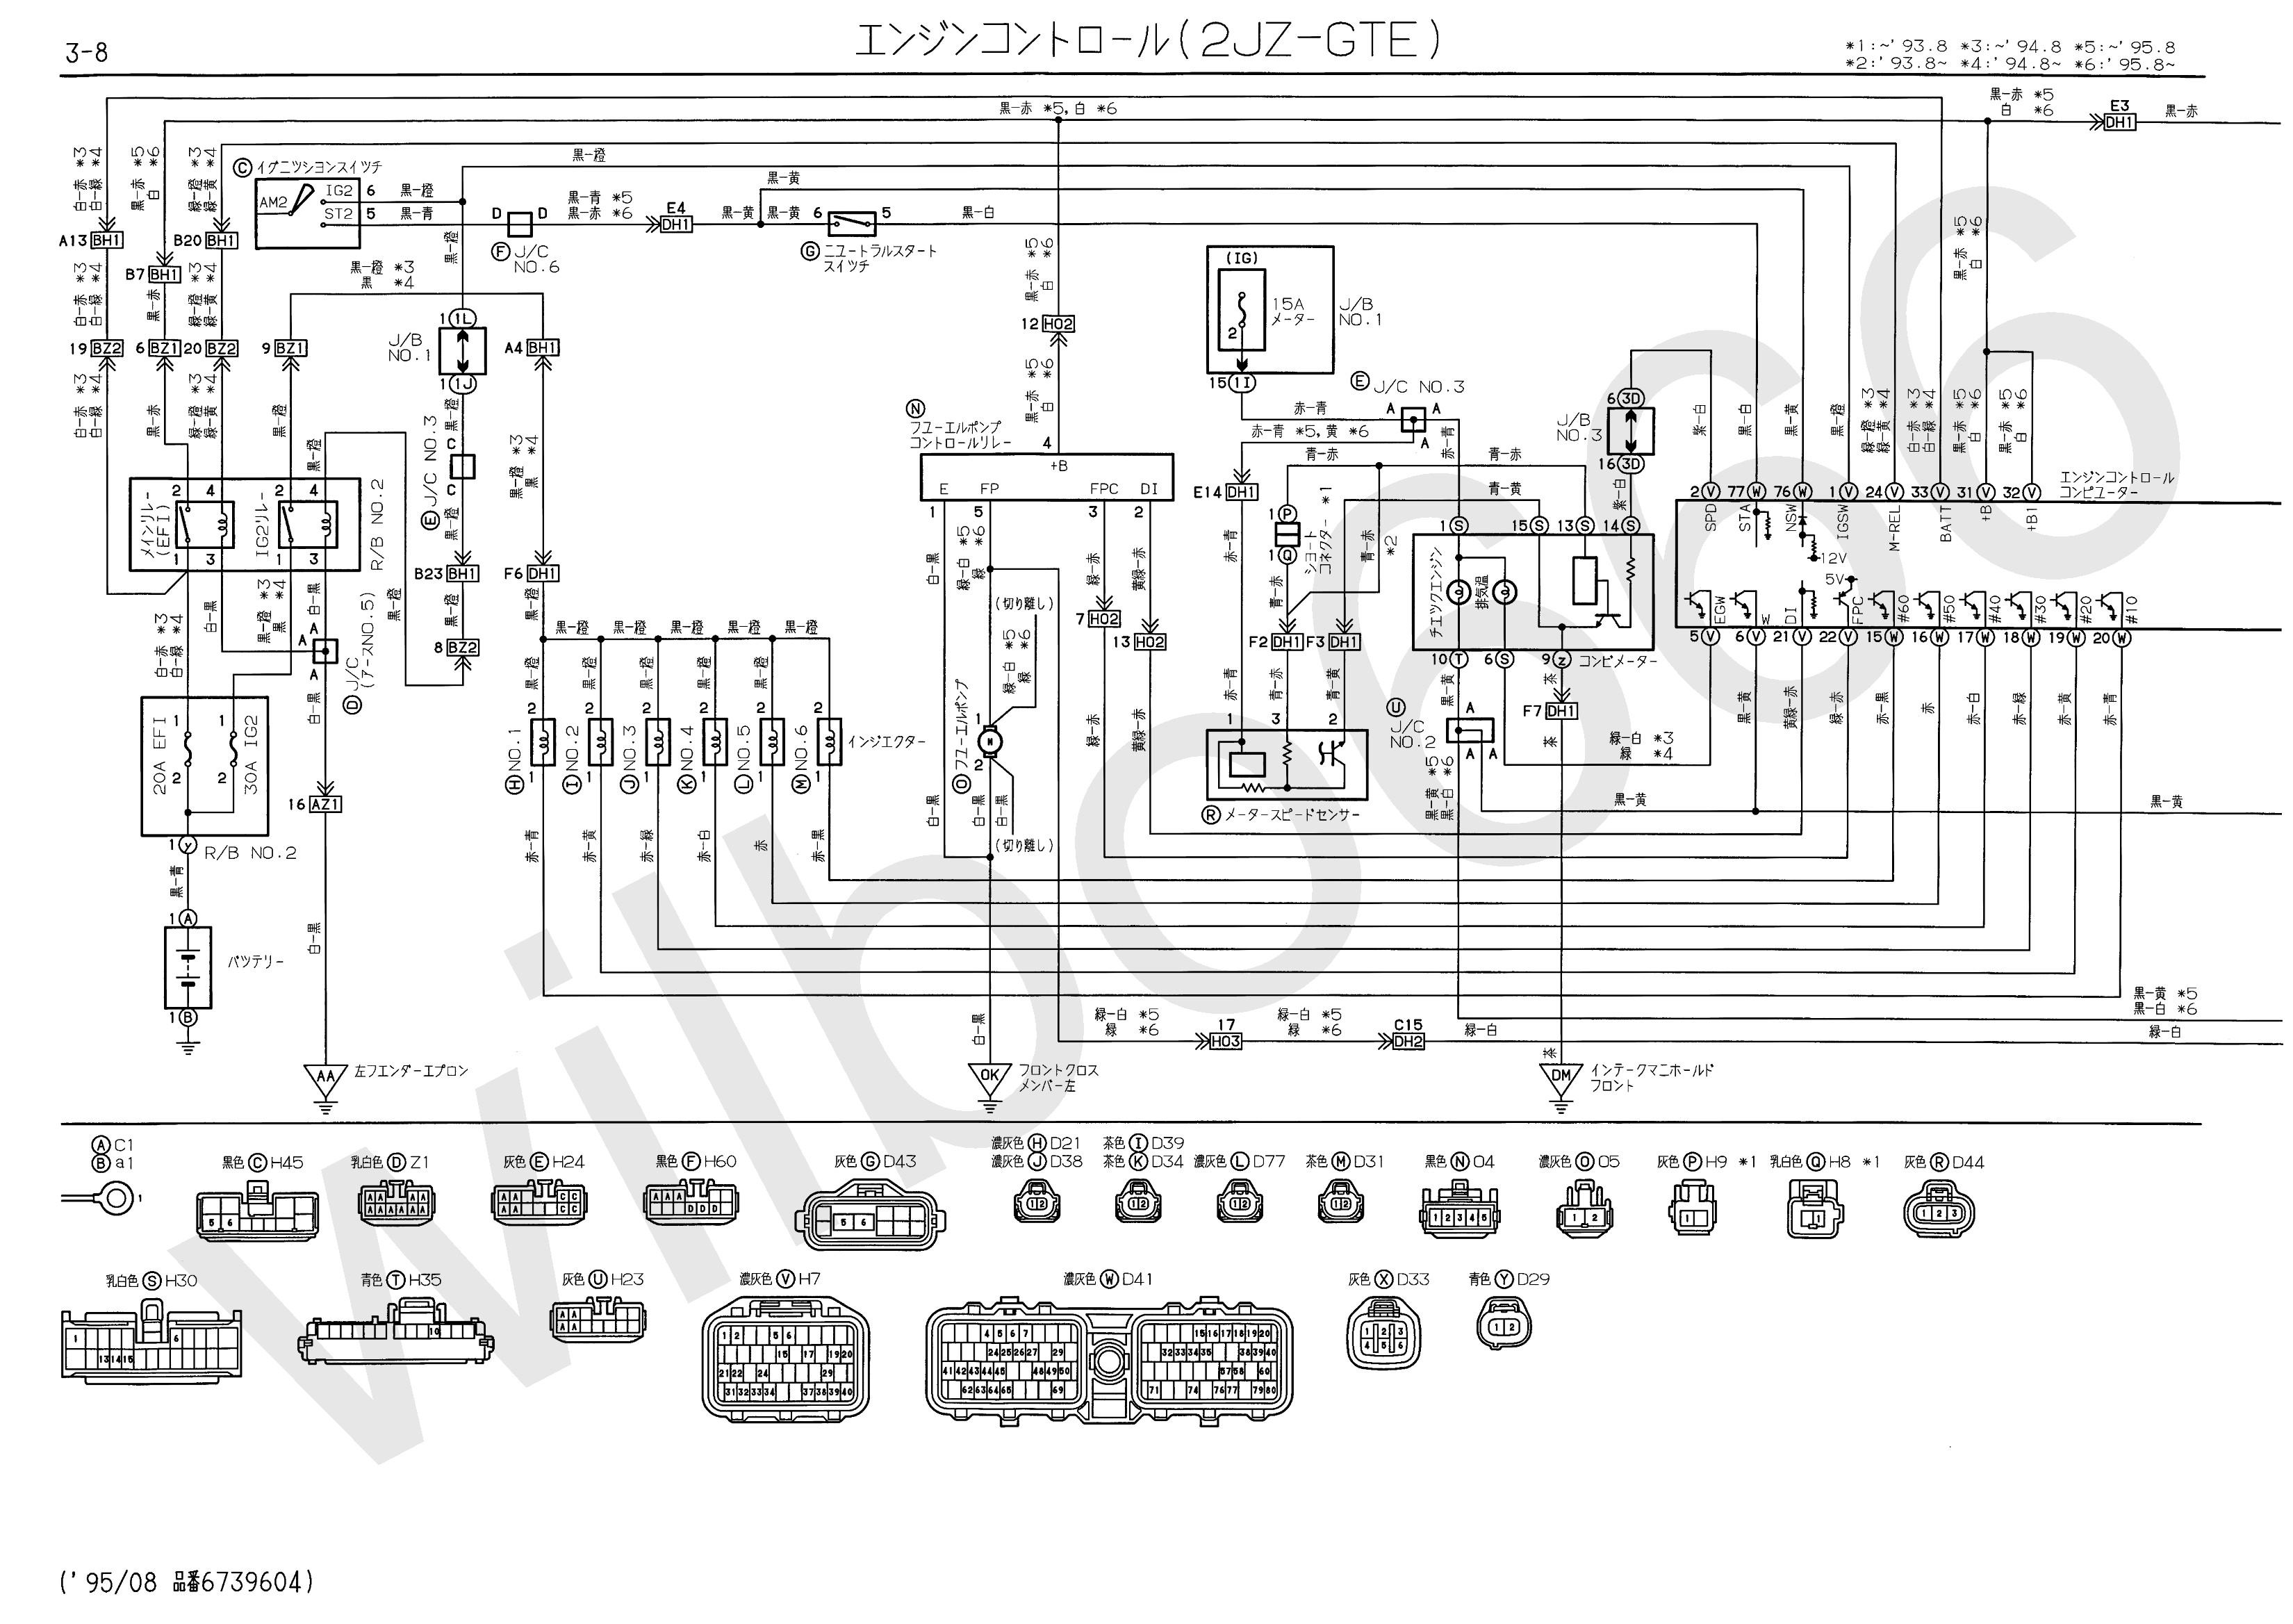 Diagram Of Fuel Injection System 1jz Series Ecu Wiring Harness Wilbo666 2jz Gte Jzs147 Aristo Engine